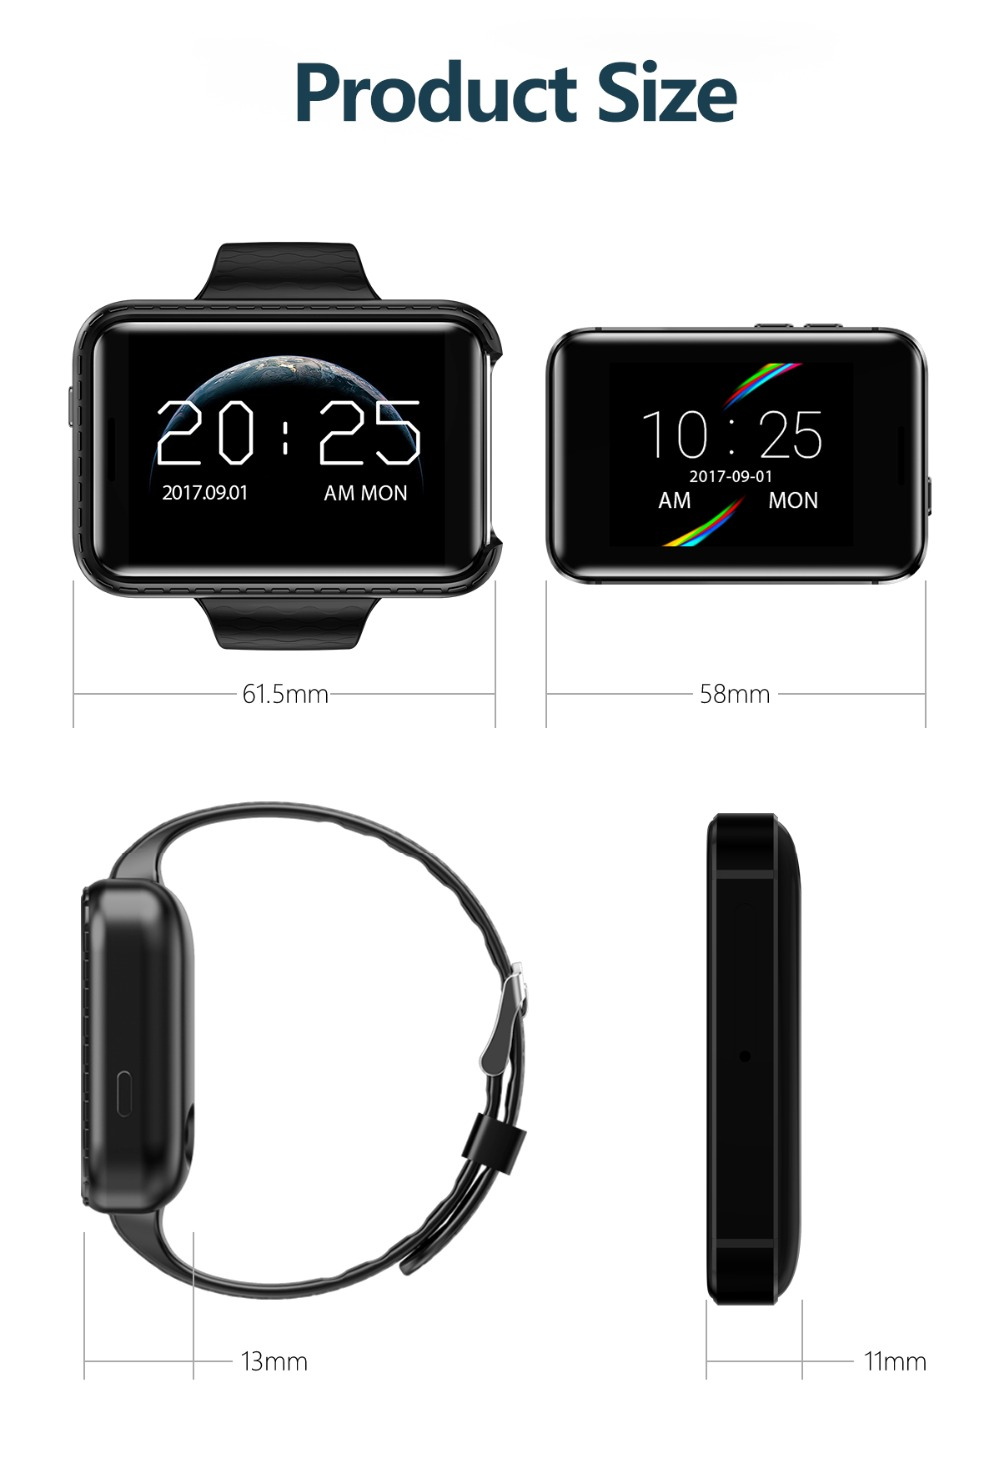 LEMADO Smart Watch I5S Watch Phone Support SIM Card Driving Recorder Pedometer Bluetooth Smartwatch Men Wristwatch PK LEM4 DM98_17